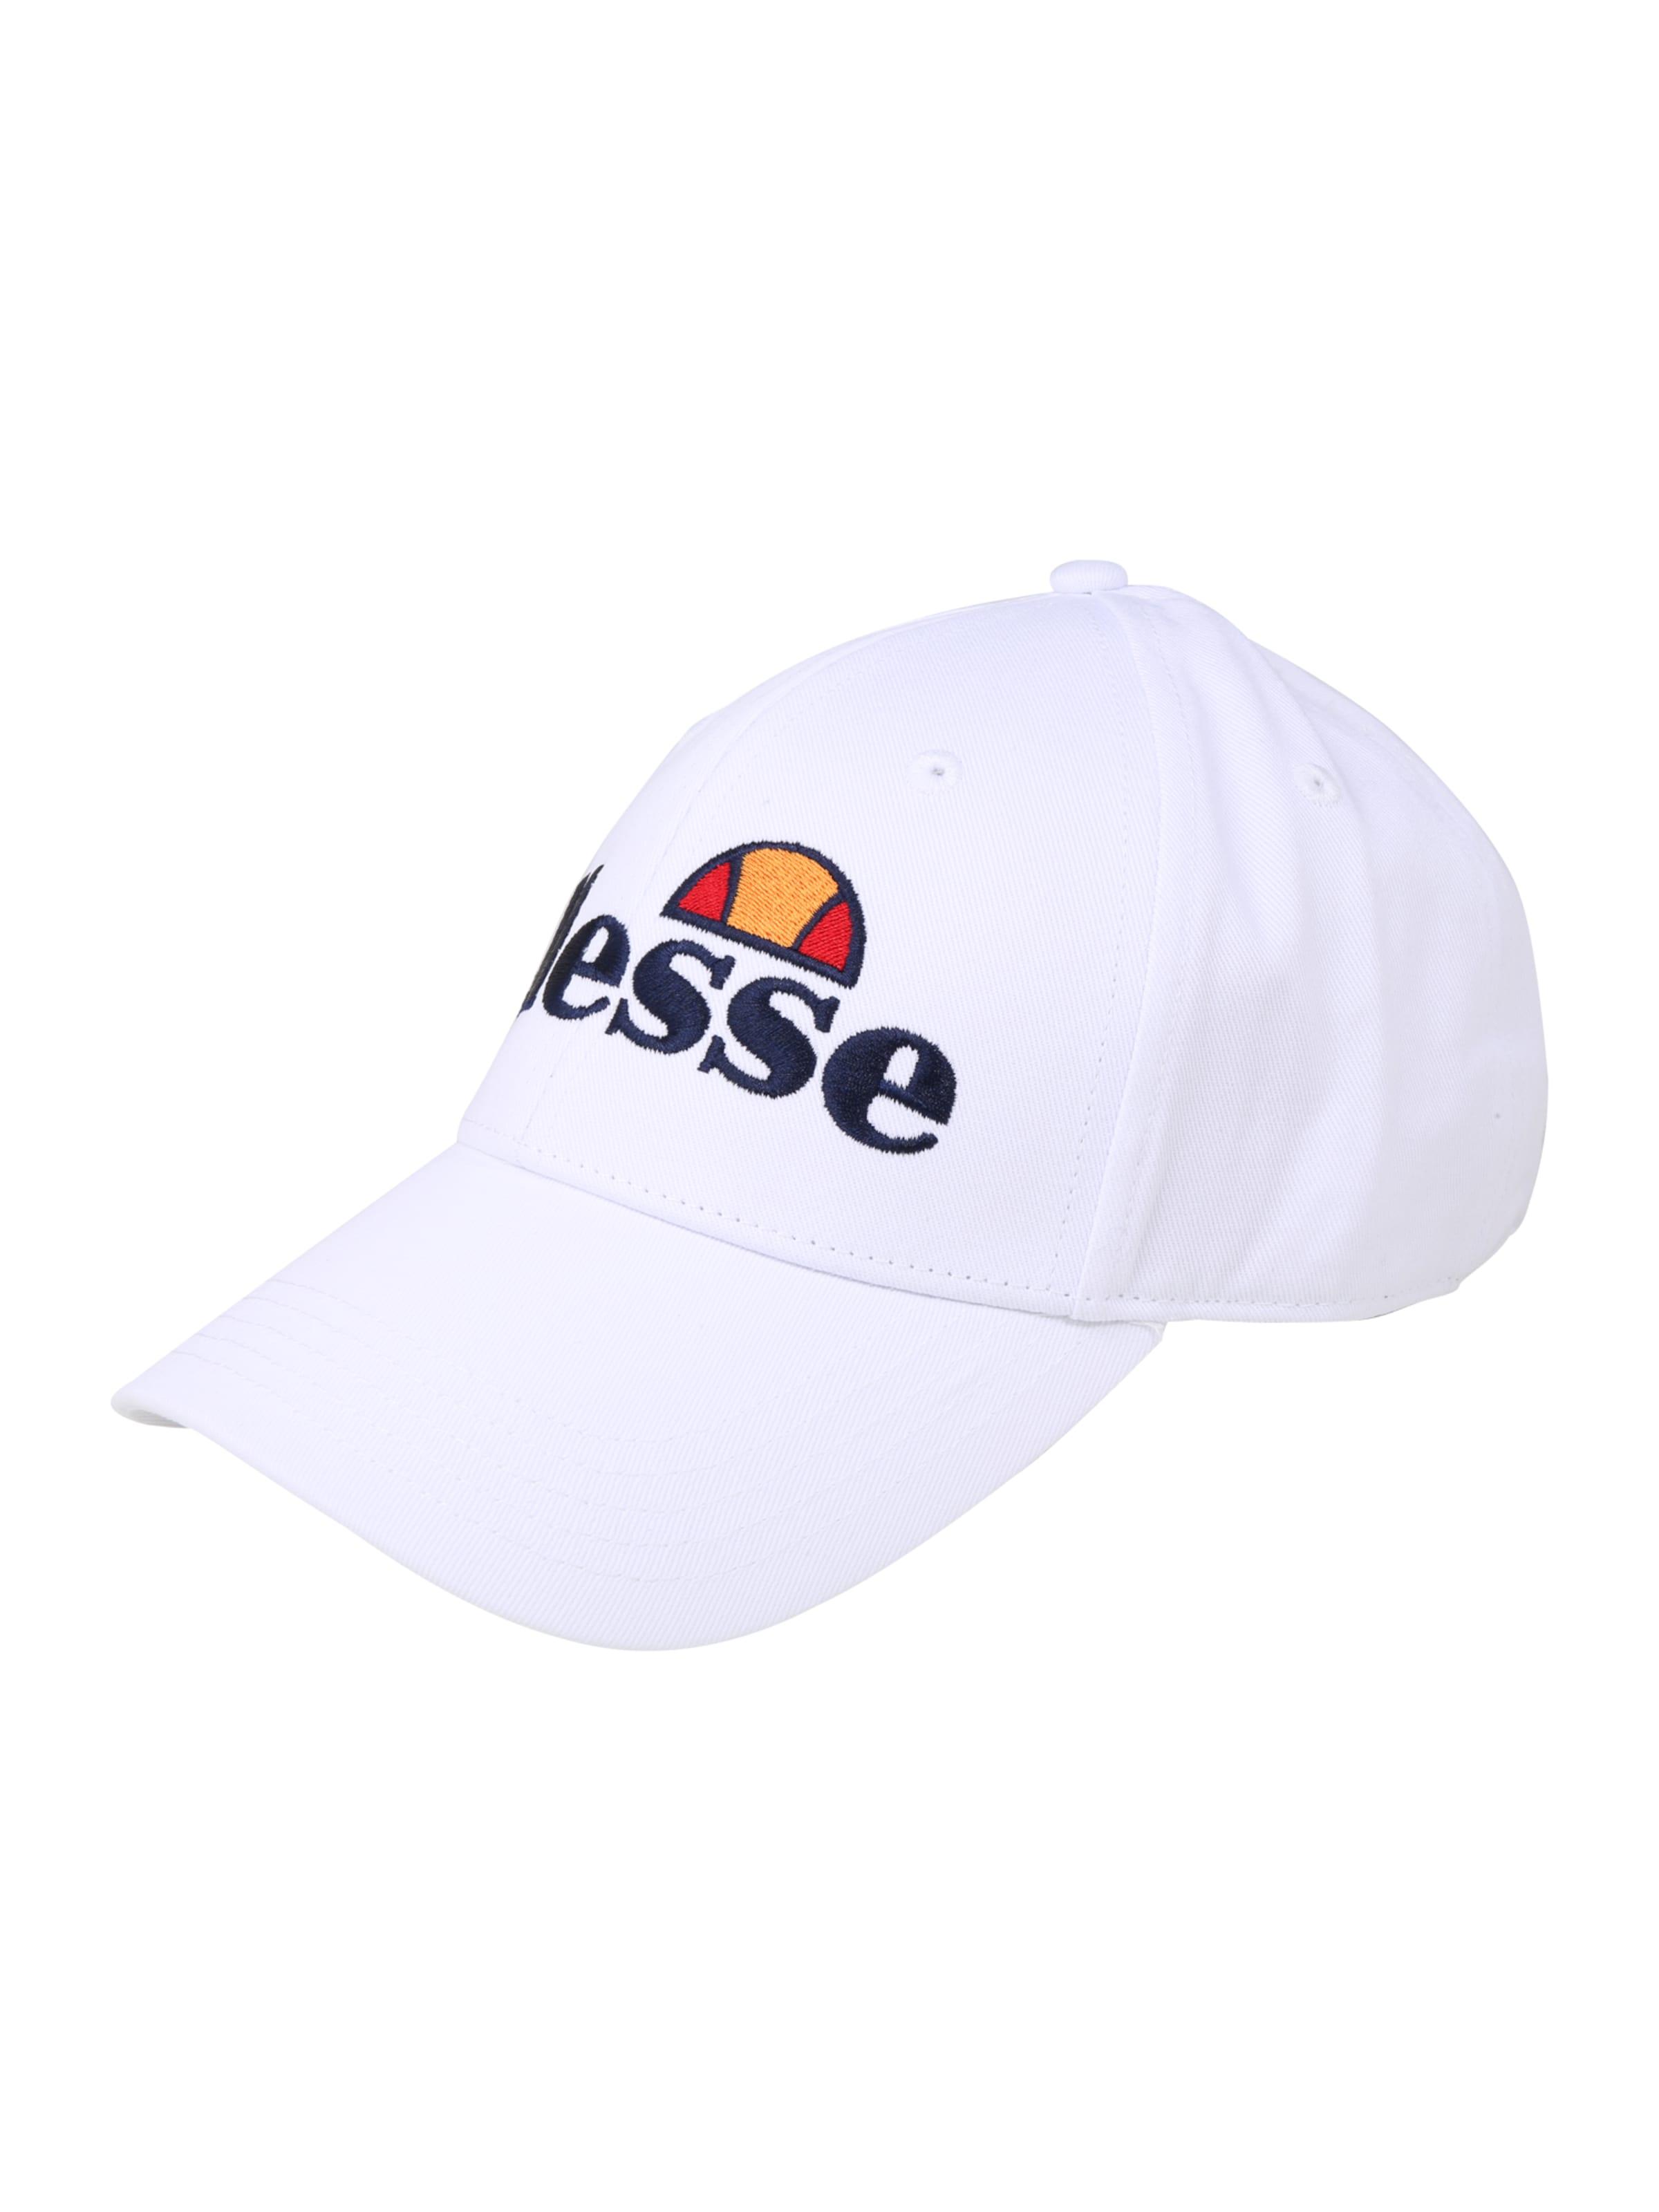 En Ellesse Noir 'regula' Casquette OrangeRouge Blanc Ygbfy6vI7